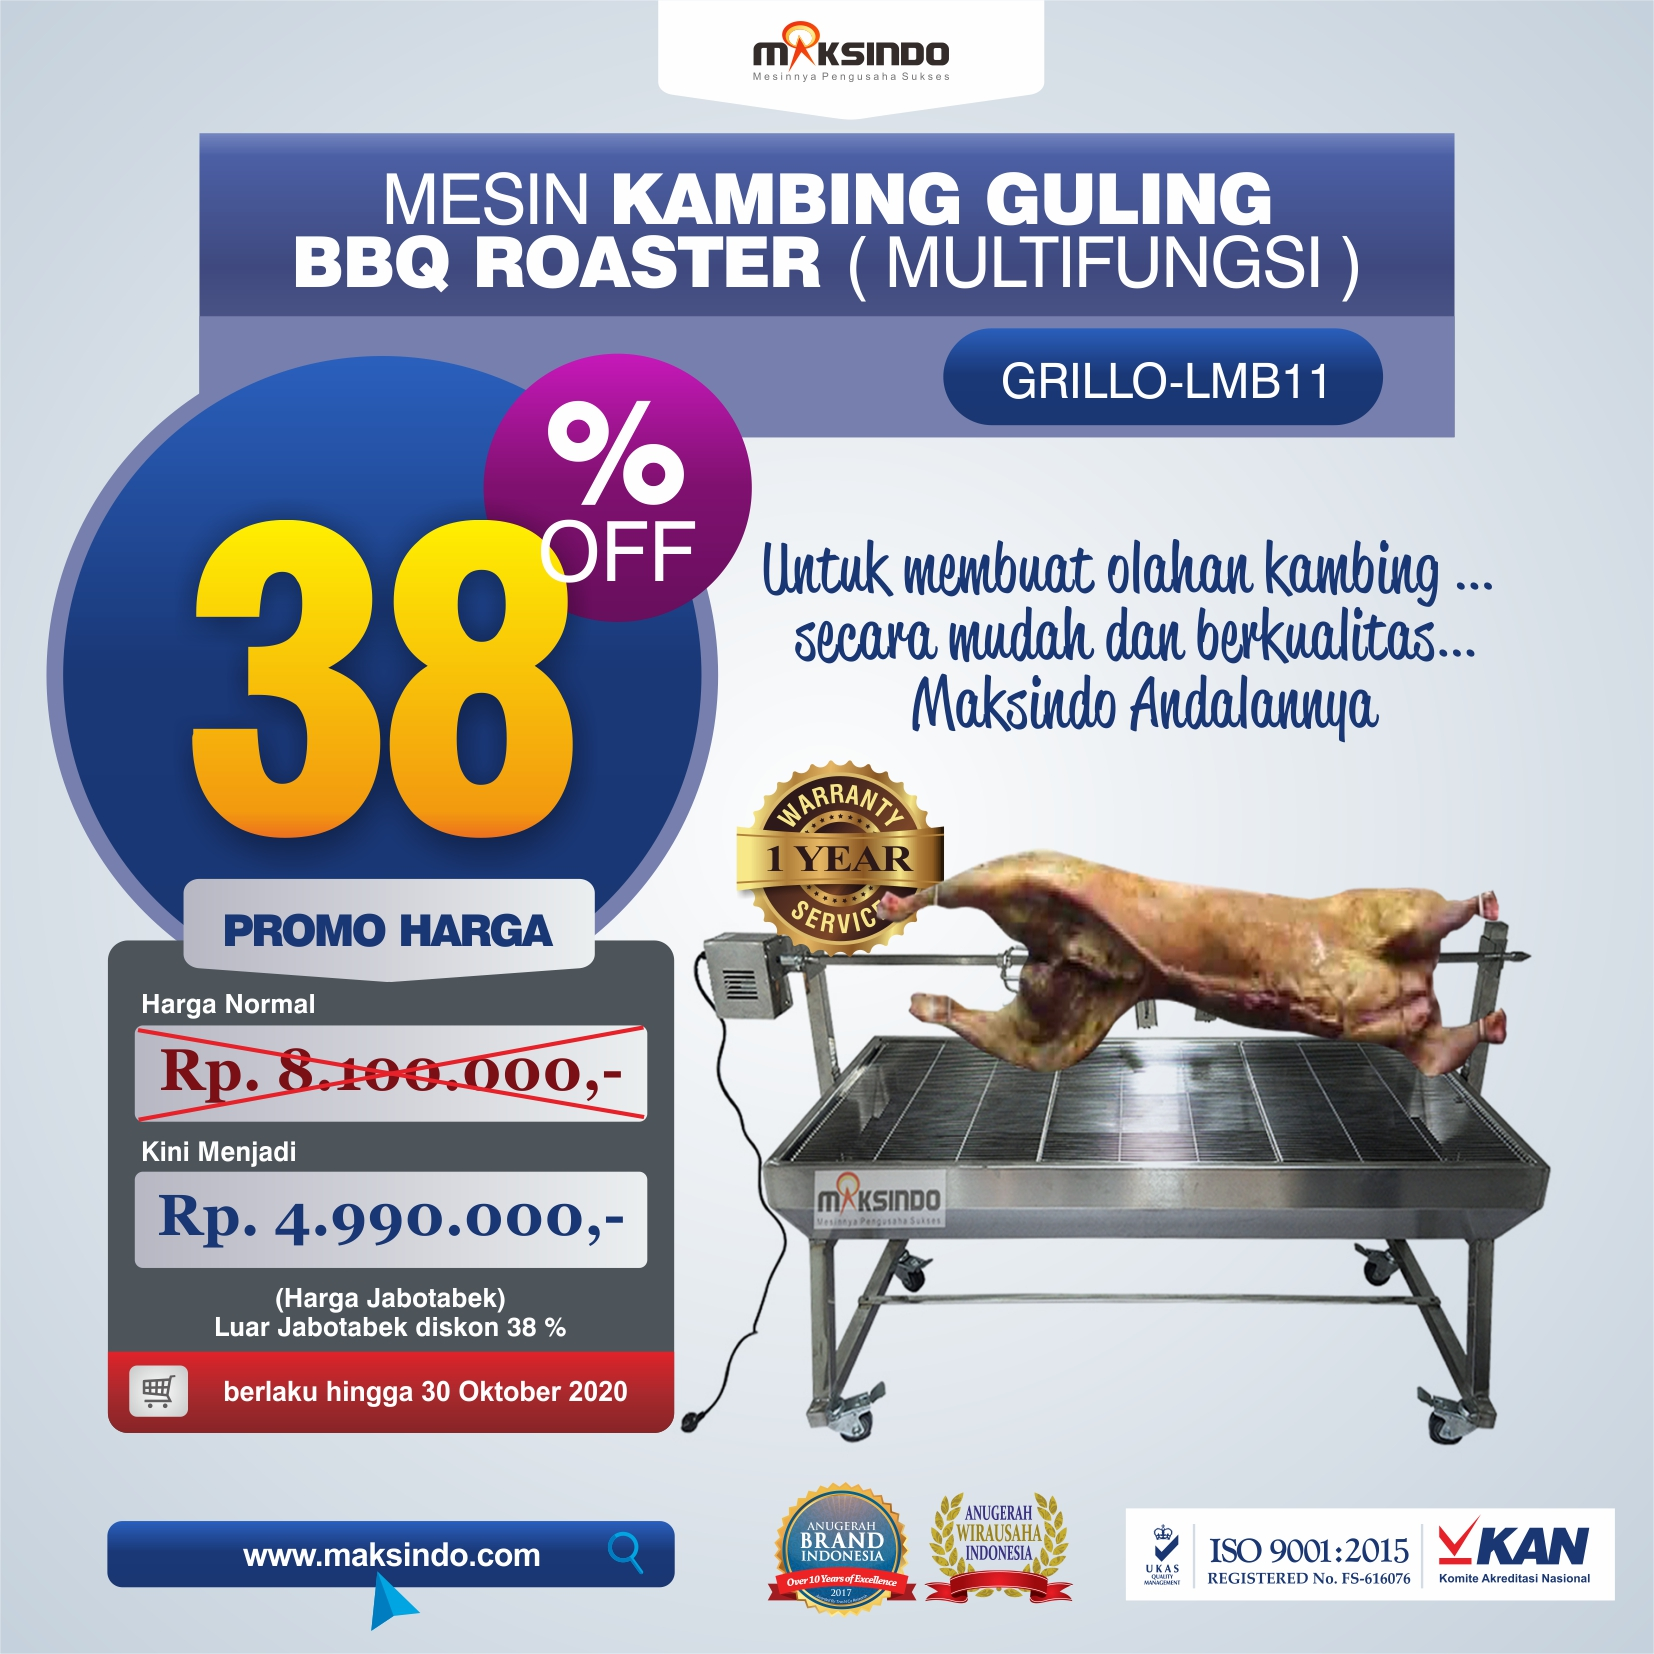 Jual Mesin Kambing Guling BBQ Roaster (GRILLO-LMB11) di Blitar